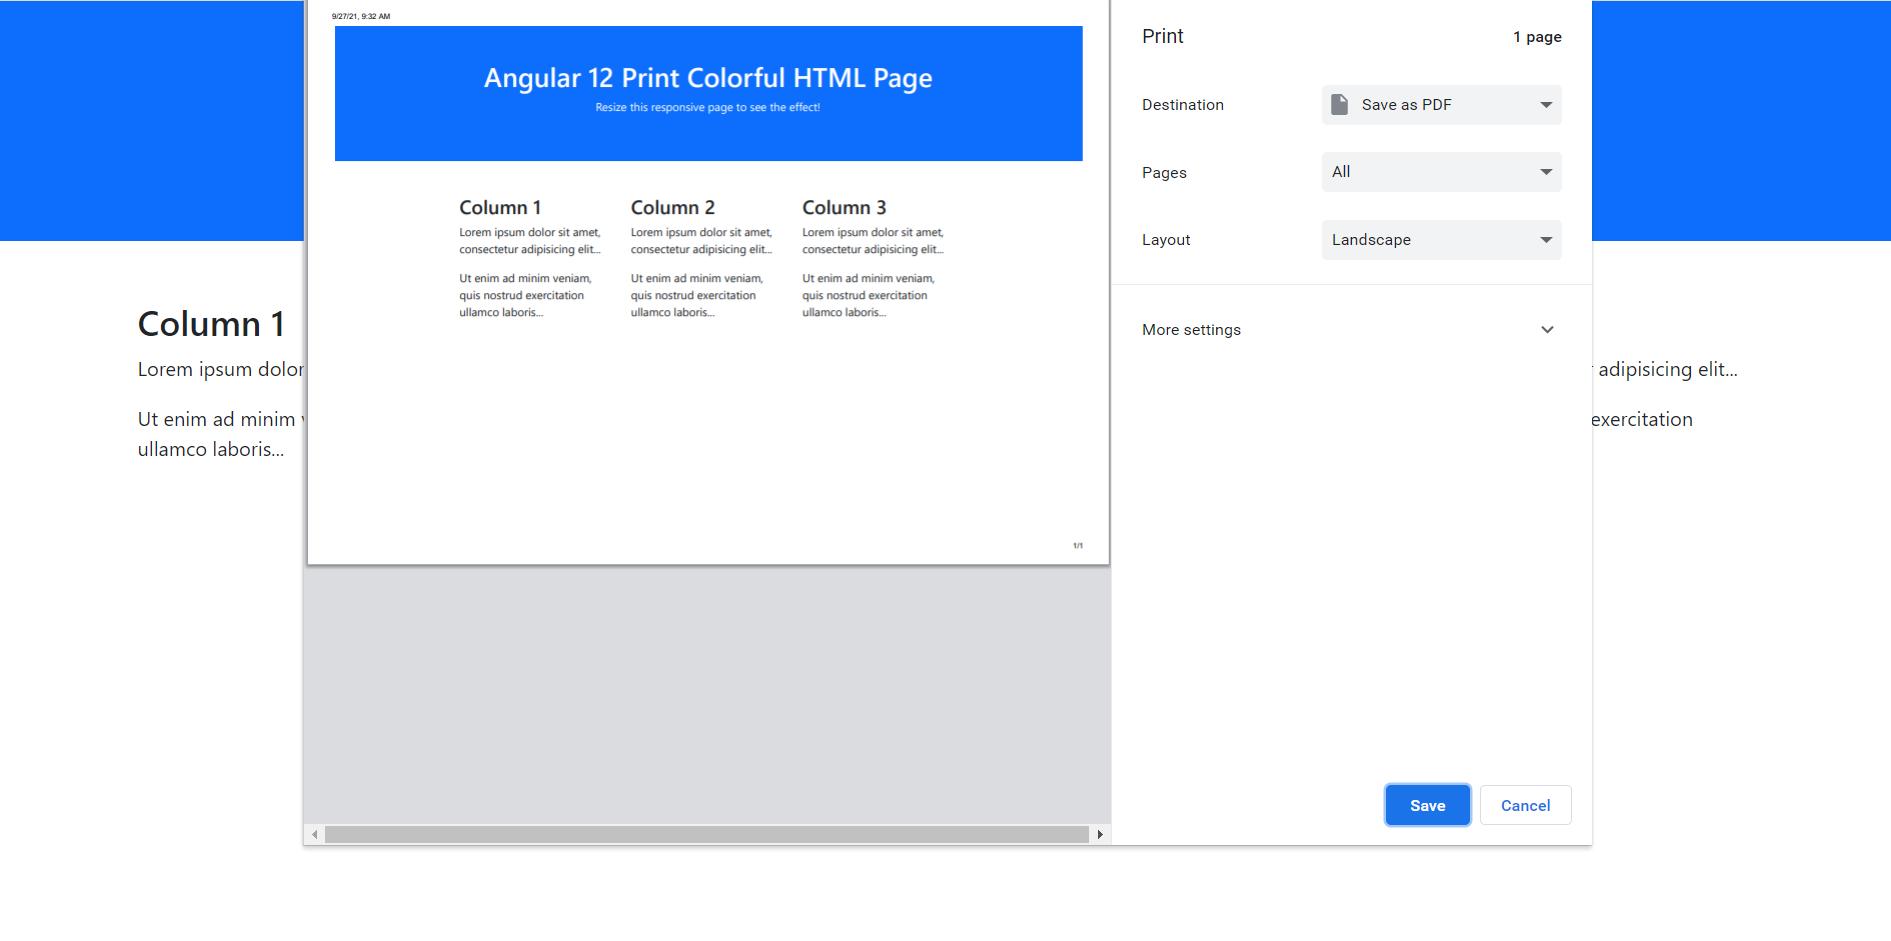 Angular 12 Print Colorful HTML Page Working Example